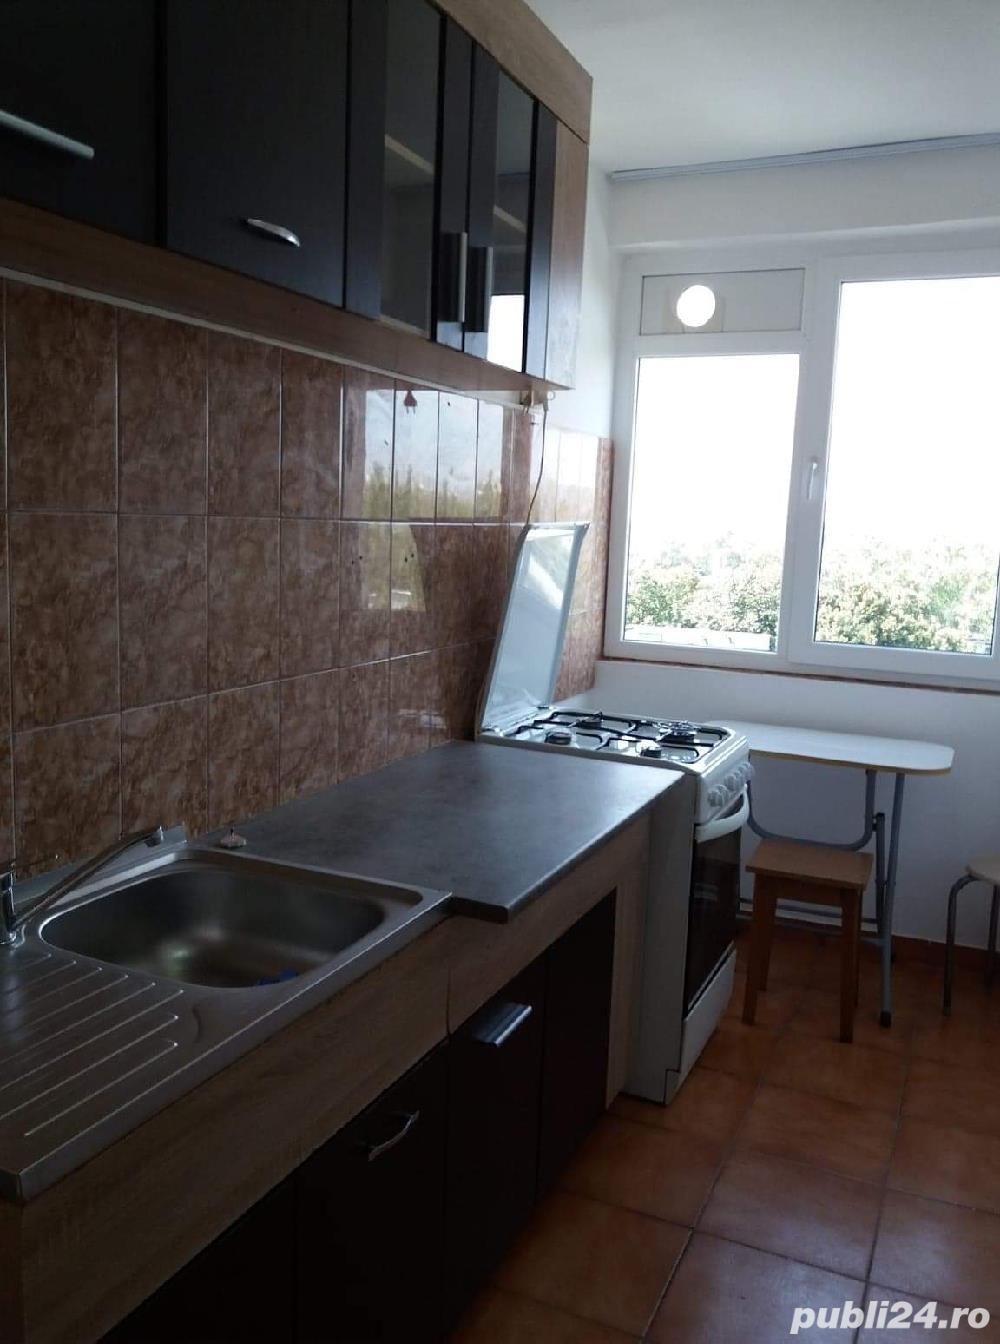 Proprietar vând apartament cu 2 camere